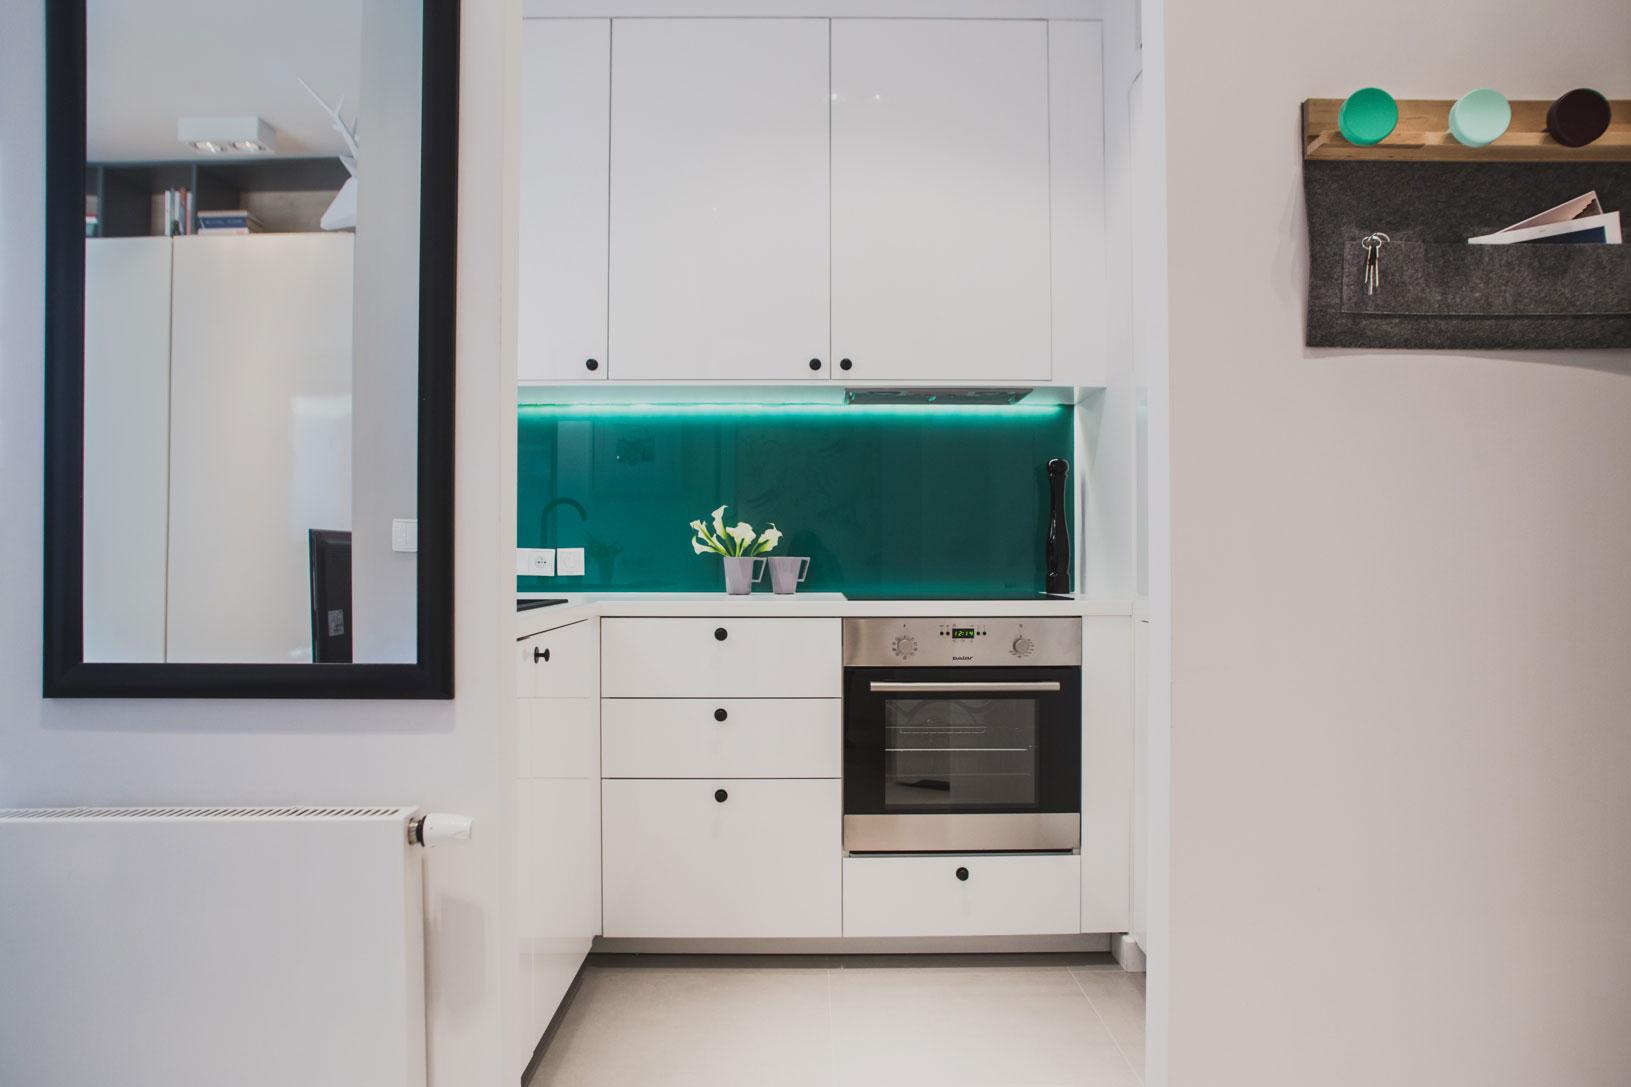 Szafarnia 2 Compact Apartment by Raca Architekci-14